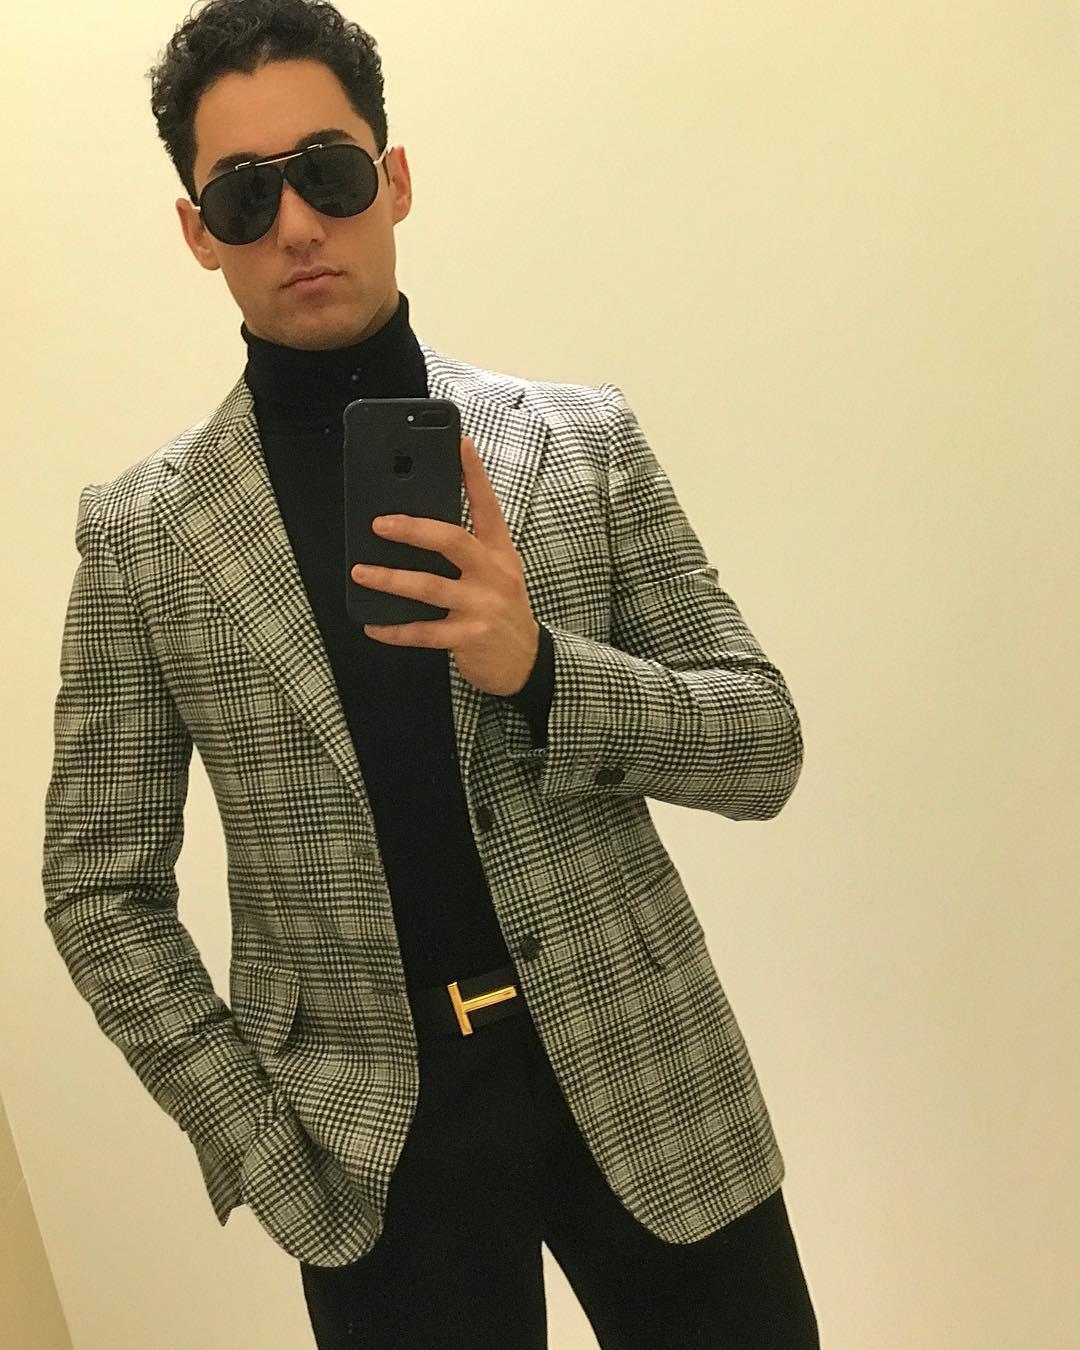 "- RALPH BEHK ""Charles"" Sport Jacket & TrousersBrunello Cucinelli SweaterTom Ford Belt & SunglassesLocation: New York, NY"